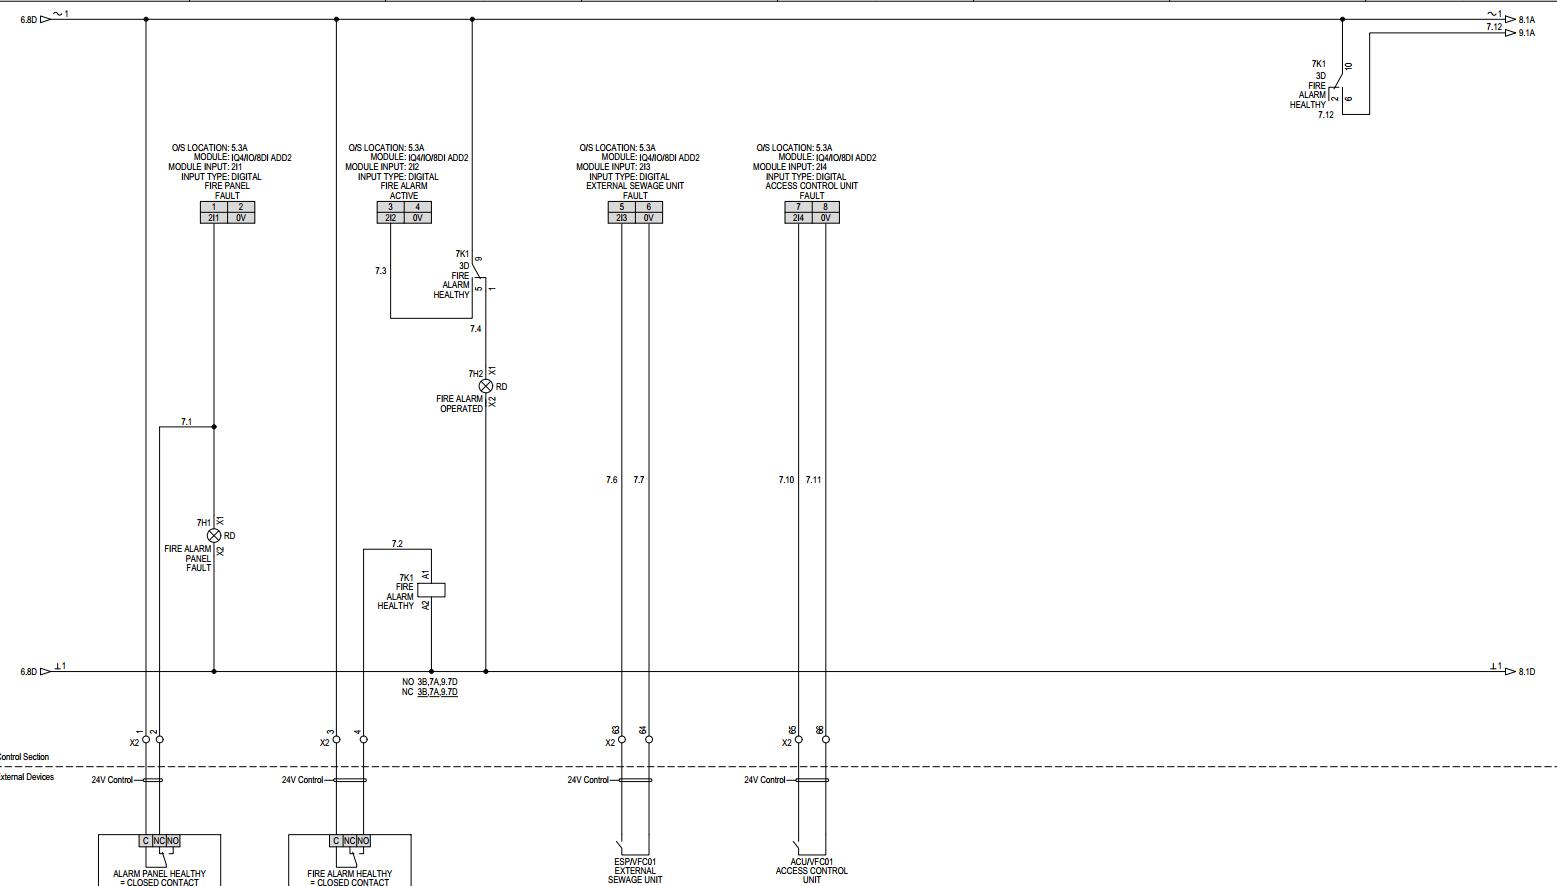 254028iA917D5B45B0FBF0B?v=1 Electrical Wire Numbers on electrical junction boxes, wire by the numbers, wire letters and numbers, electrical wires for shared, circuit breaker numbers, steel numbers,